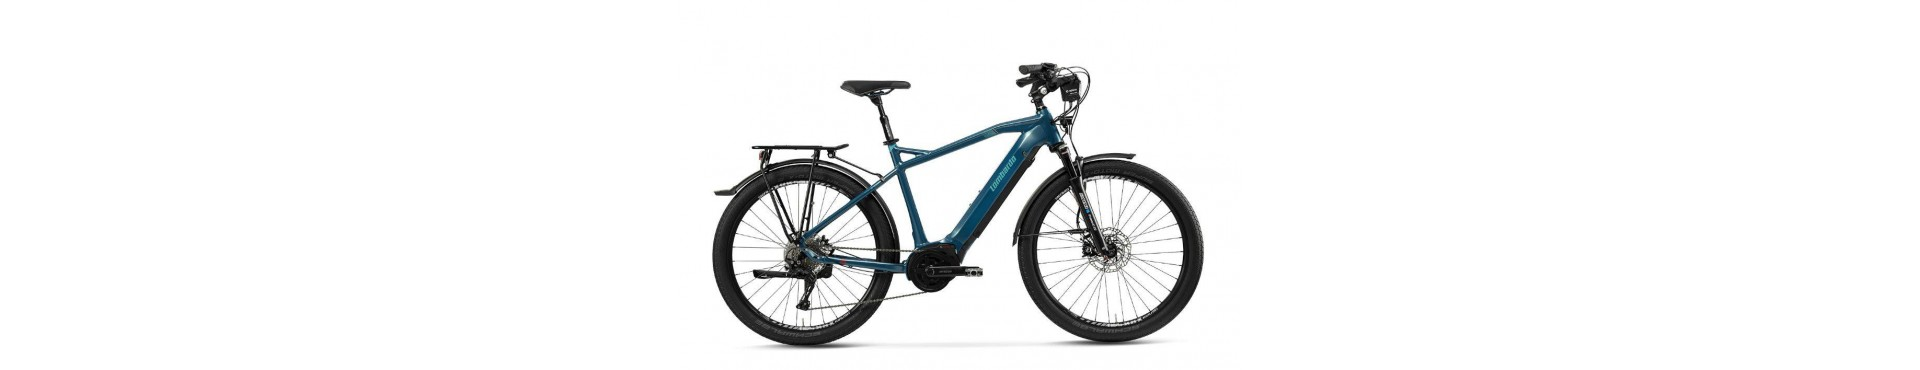 Biciclette ecobike pedalata assistita